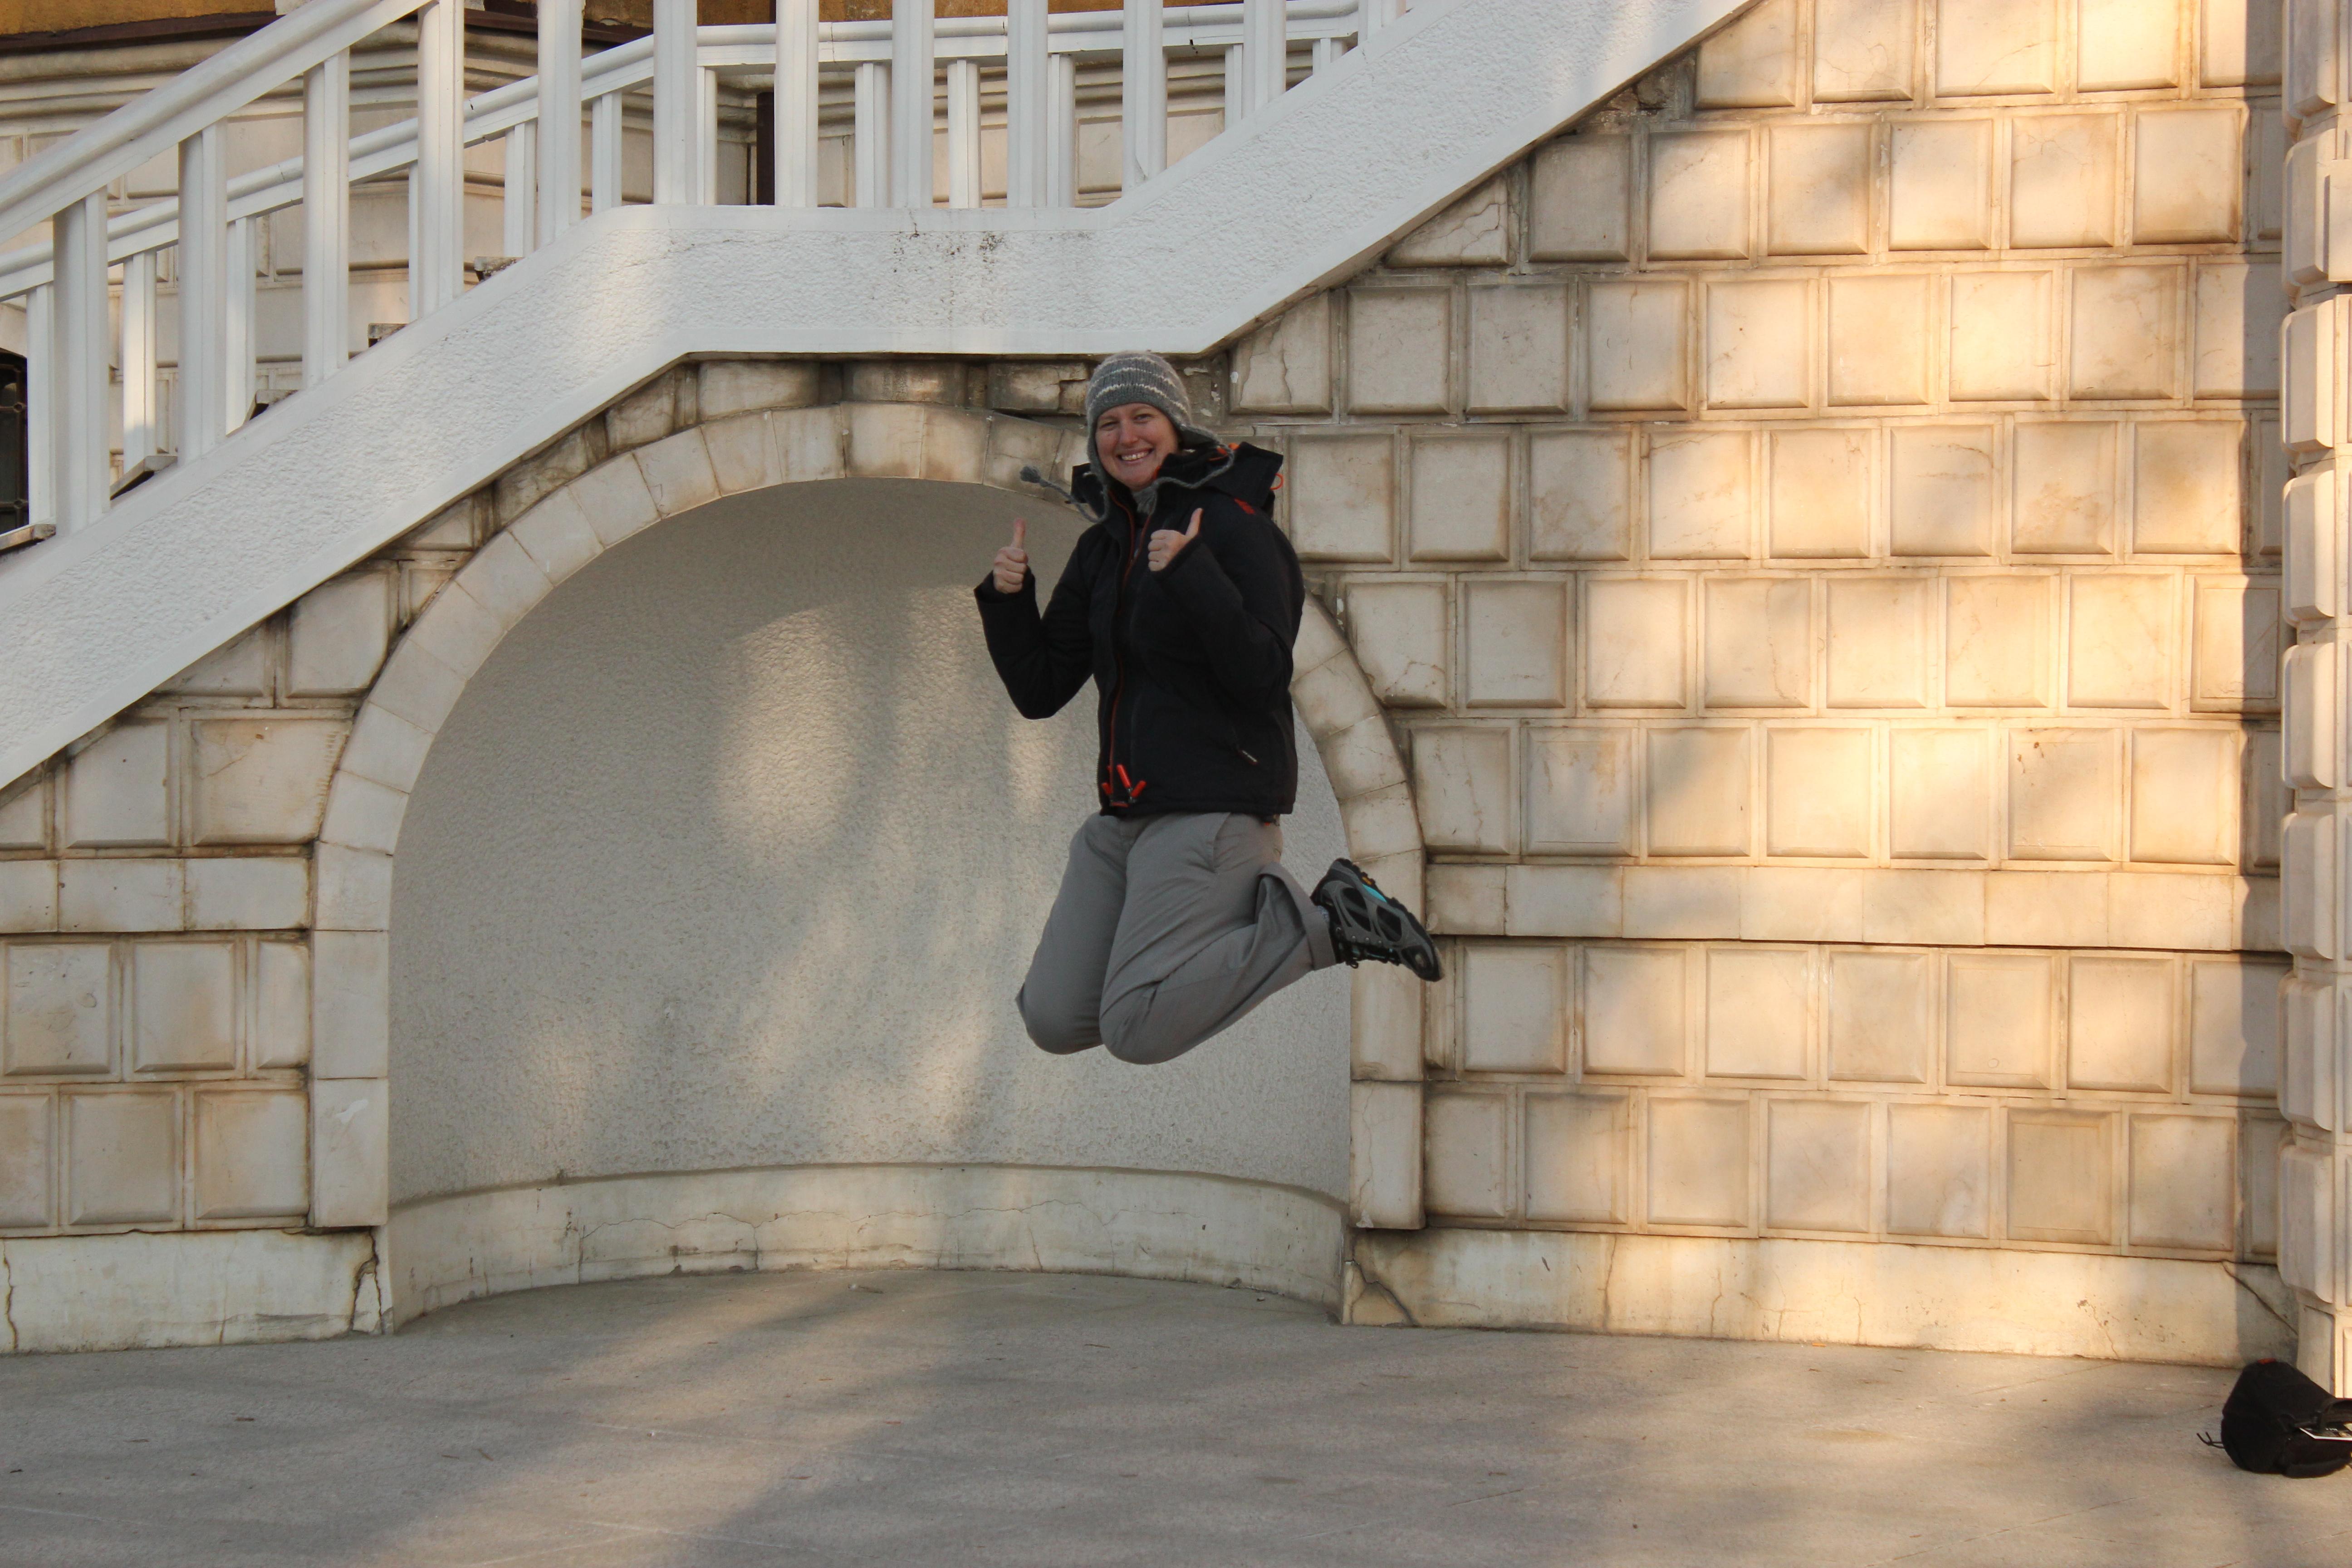 Signature Jumpin' Photograph; Pristina, Kosovo; 2013